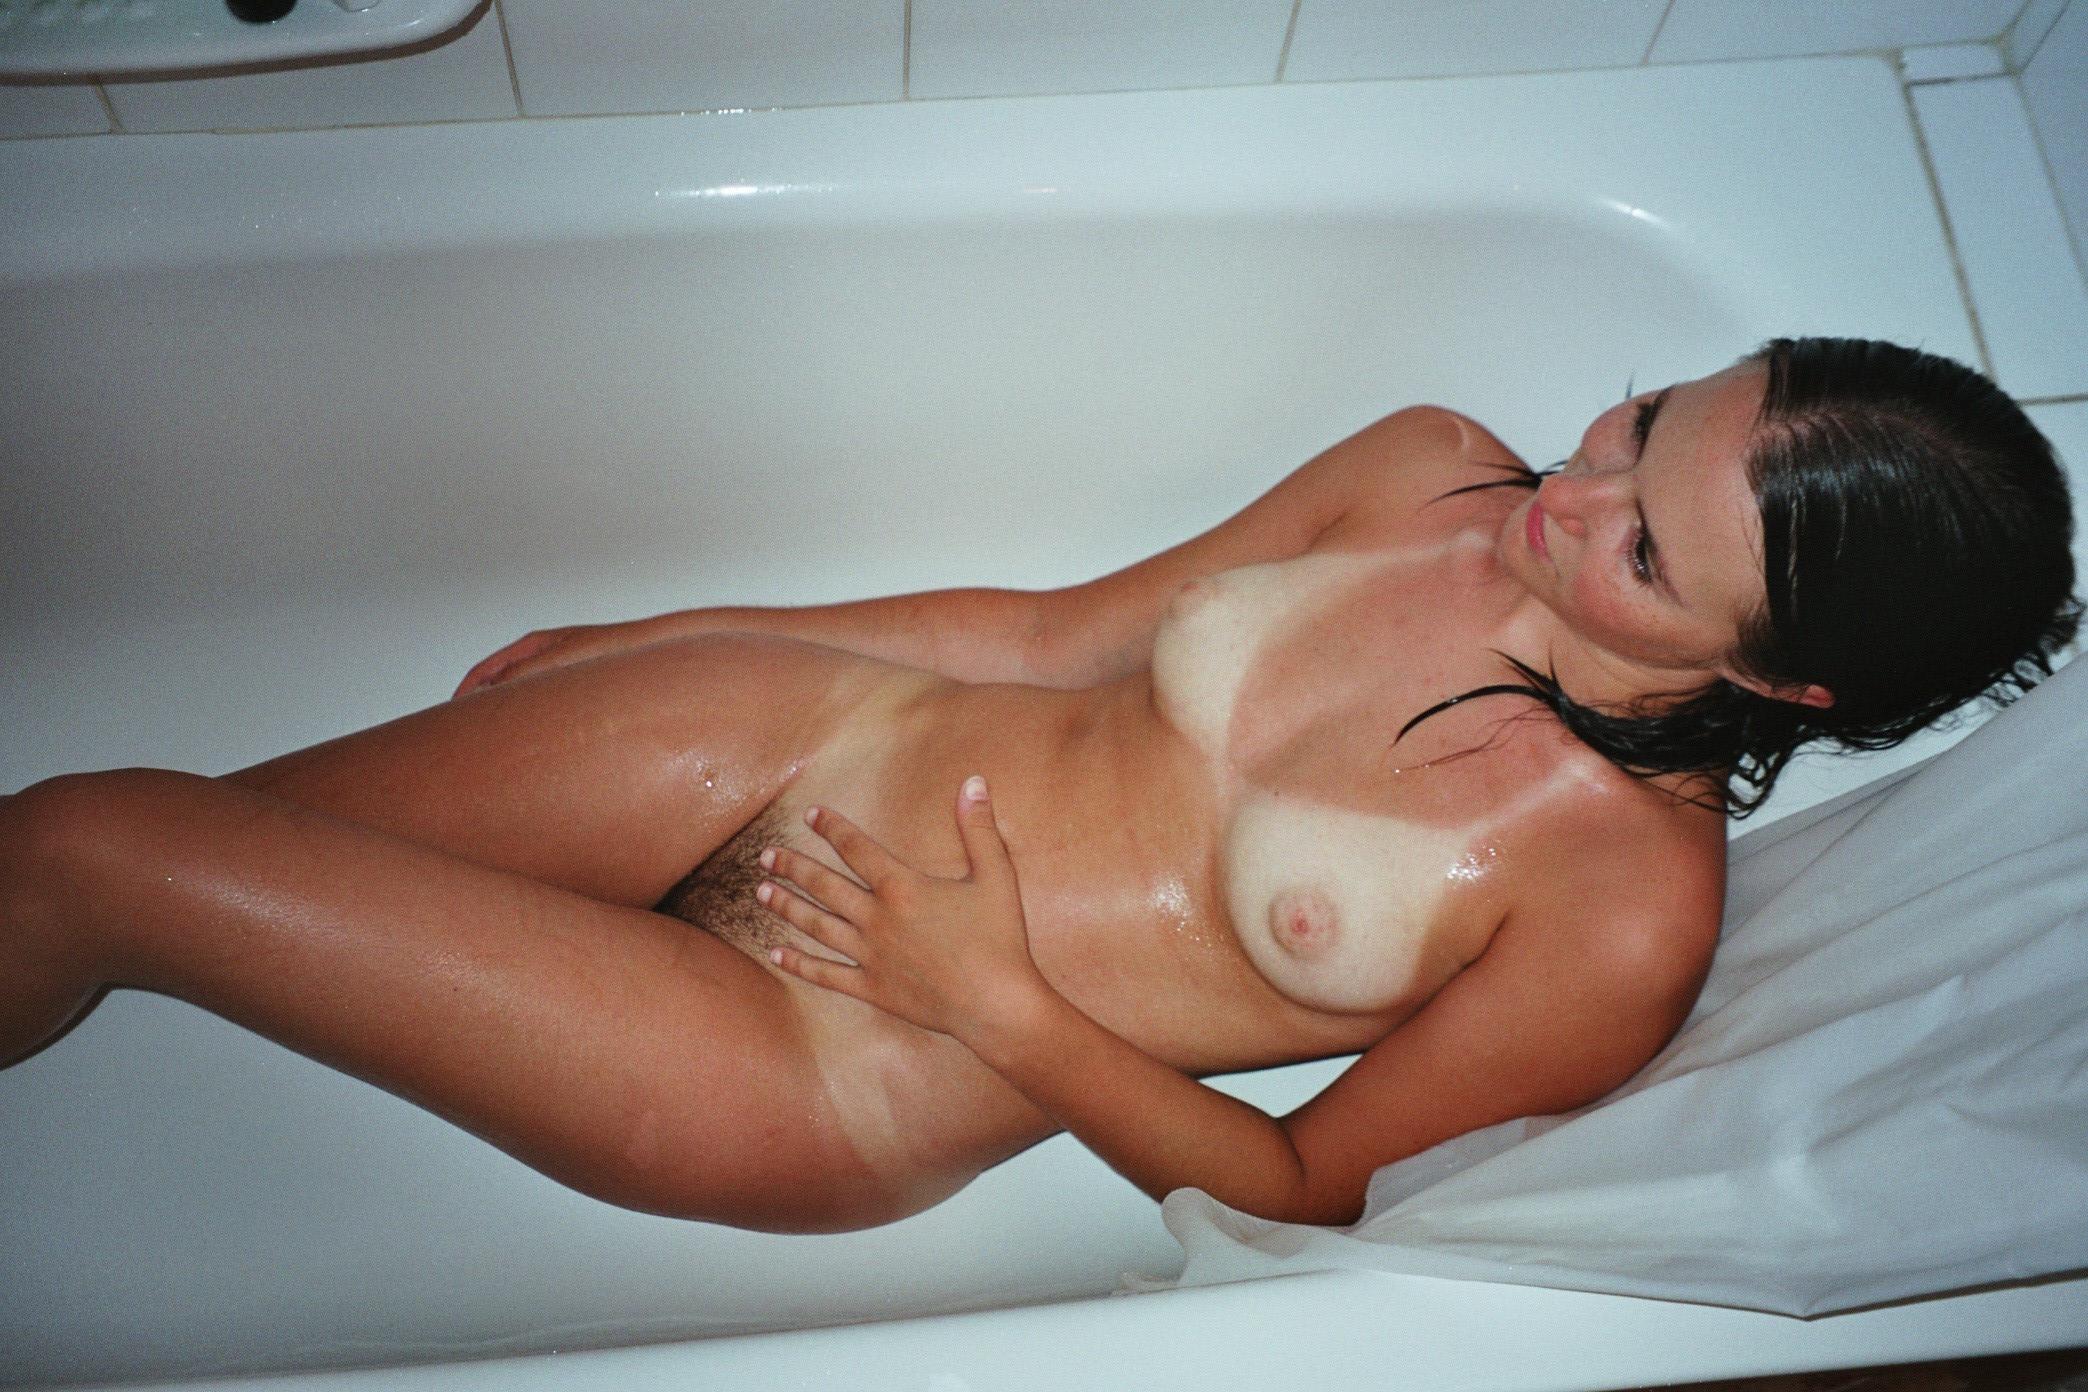 naked-girls-taking-bath-boobs-wet-mix-vol4-29